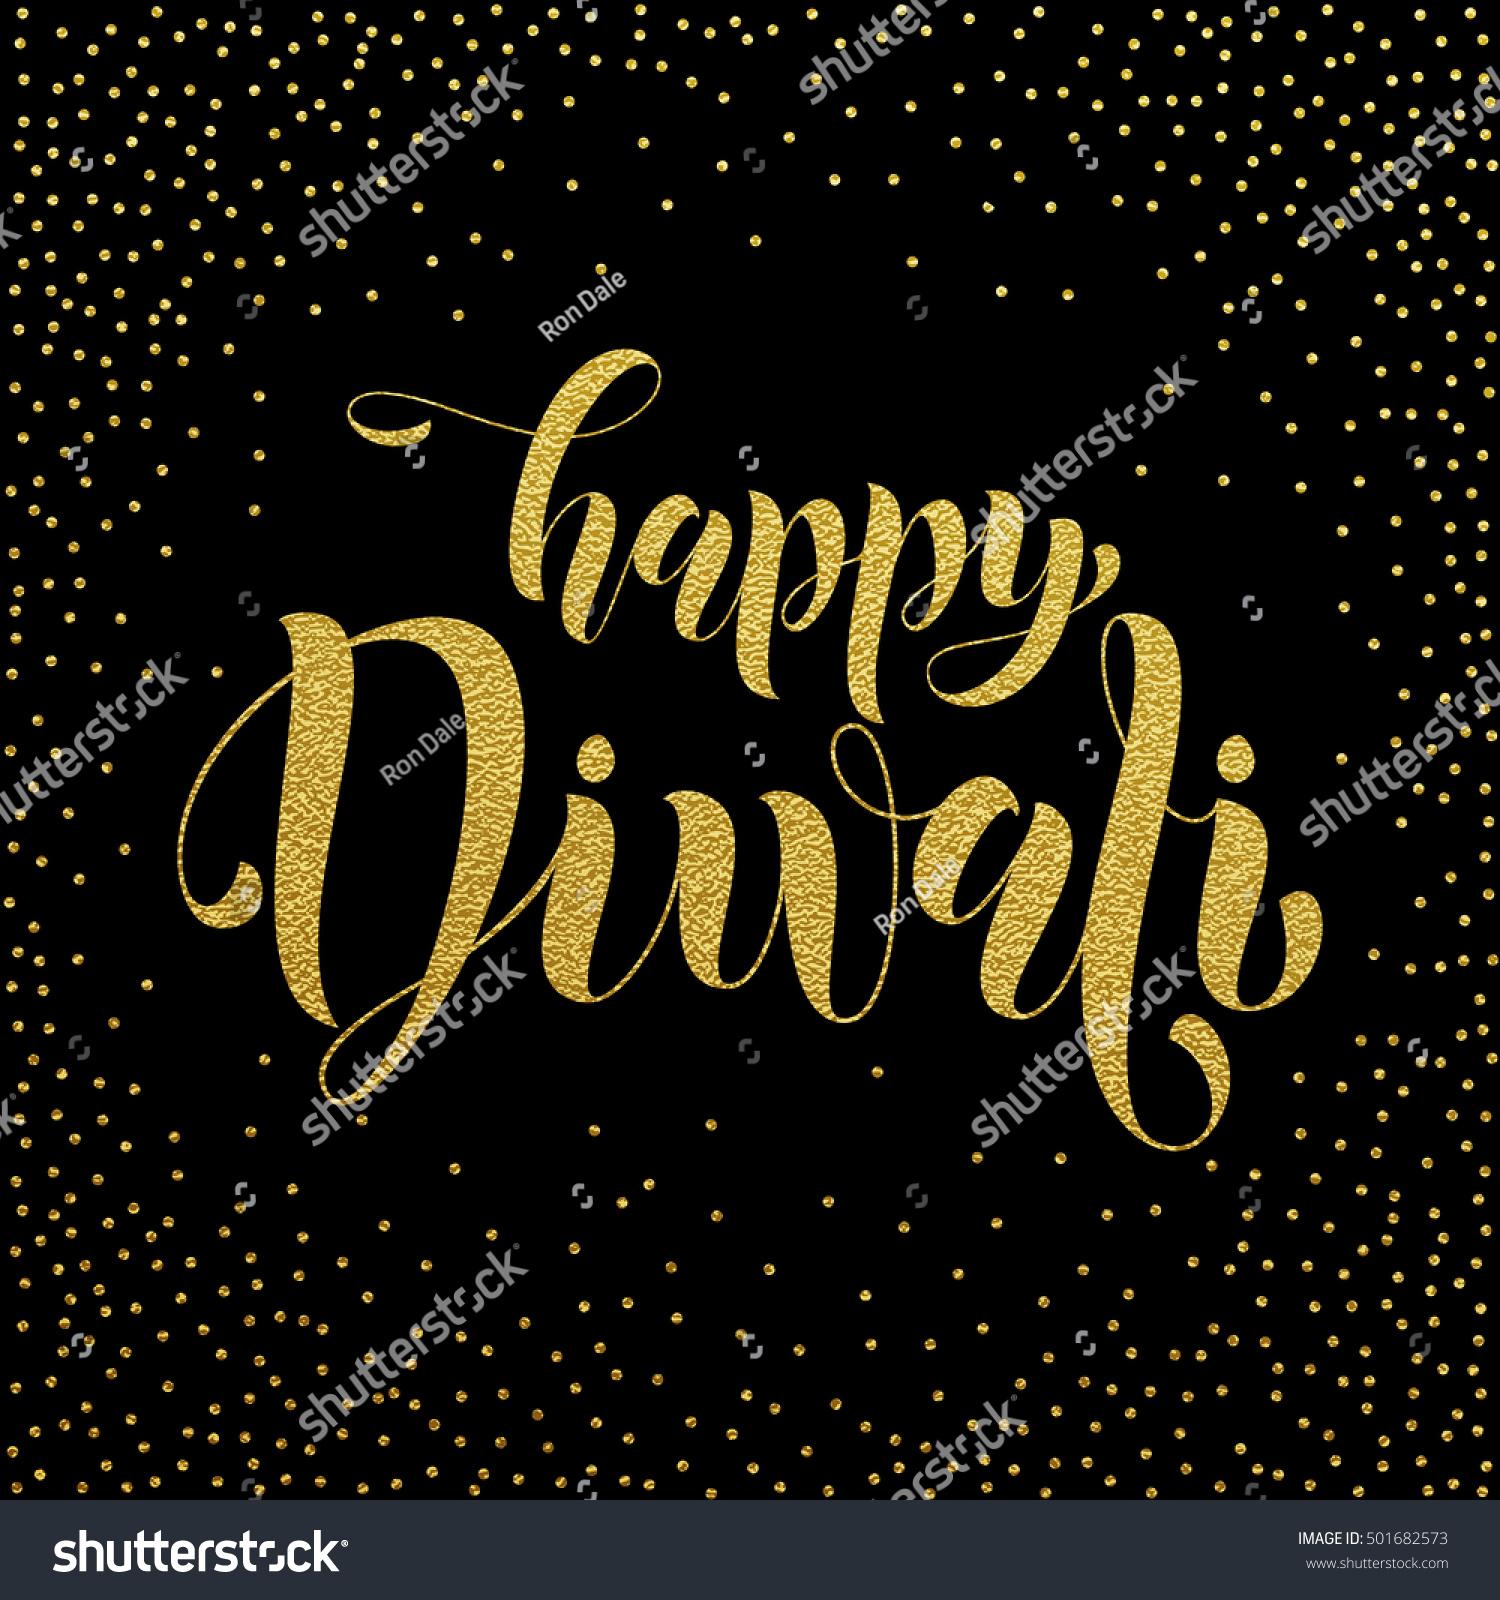 Happy diwali vector gold glittering text stock vector 501682573 happy diwali vector gold glittering text diwali or deepavali festival banner on black background kristyandbryce Gallery